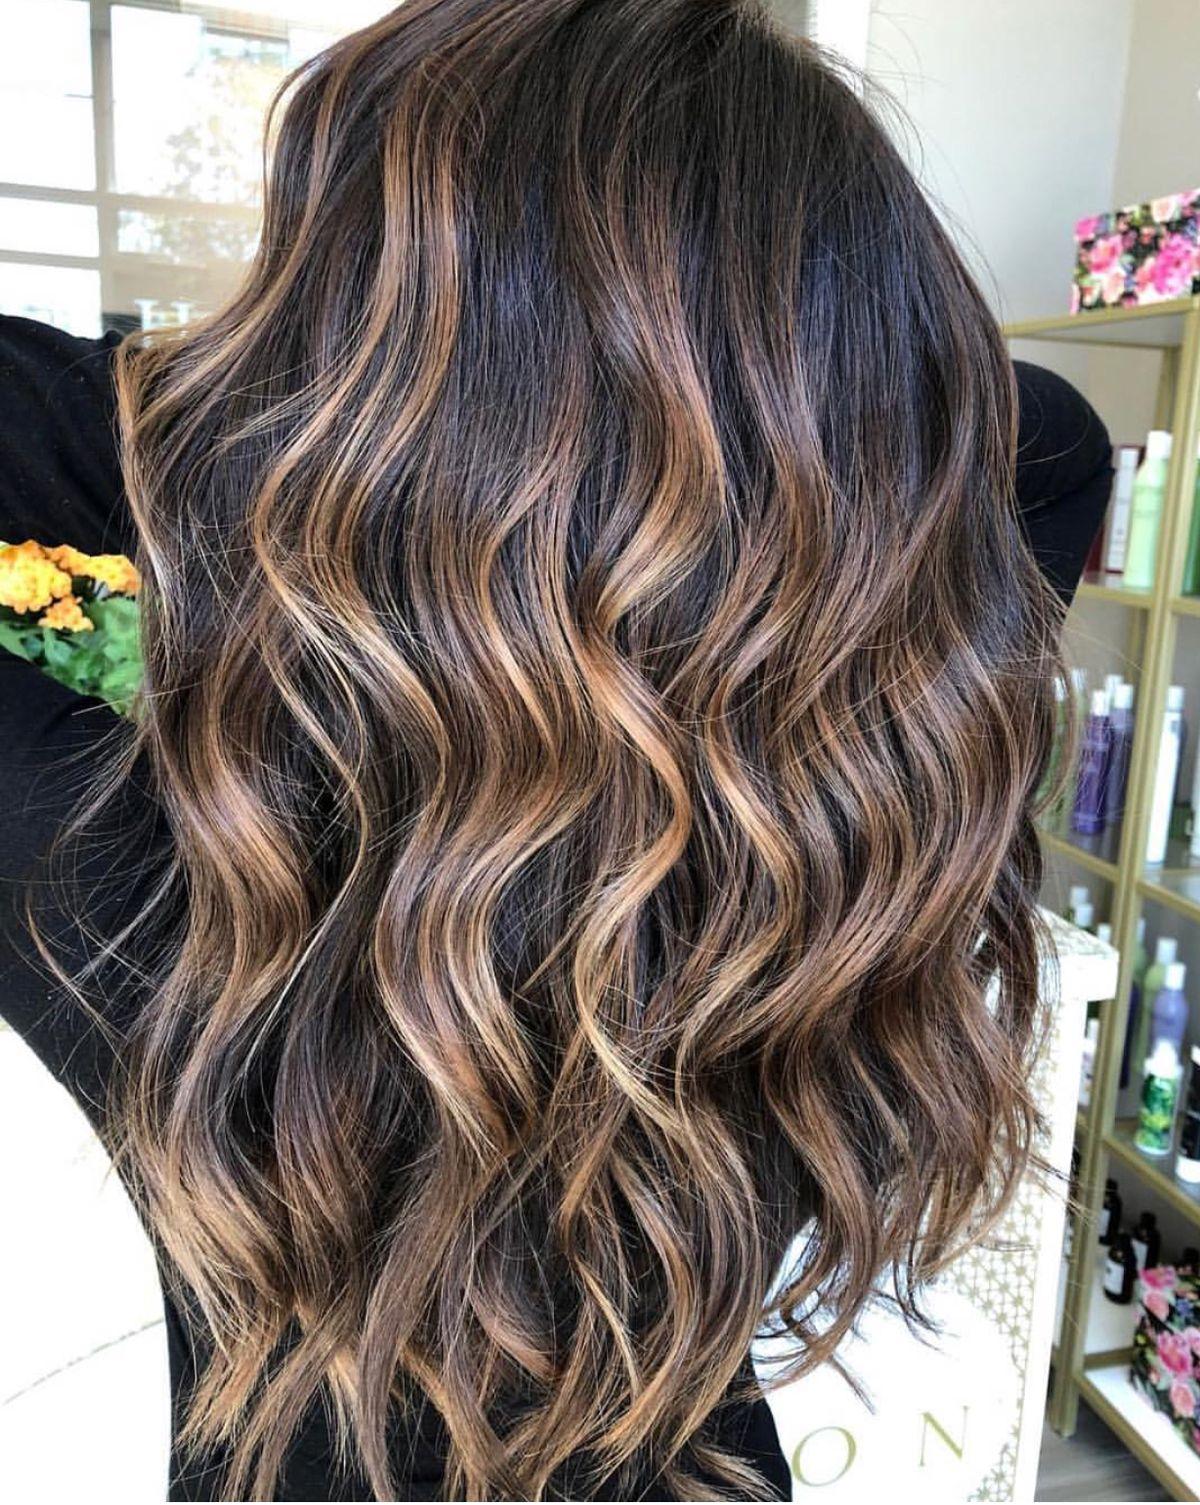 Hair Inspiration 2019-04-24 22:12:39